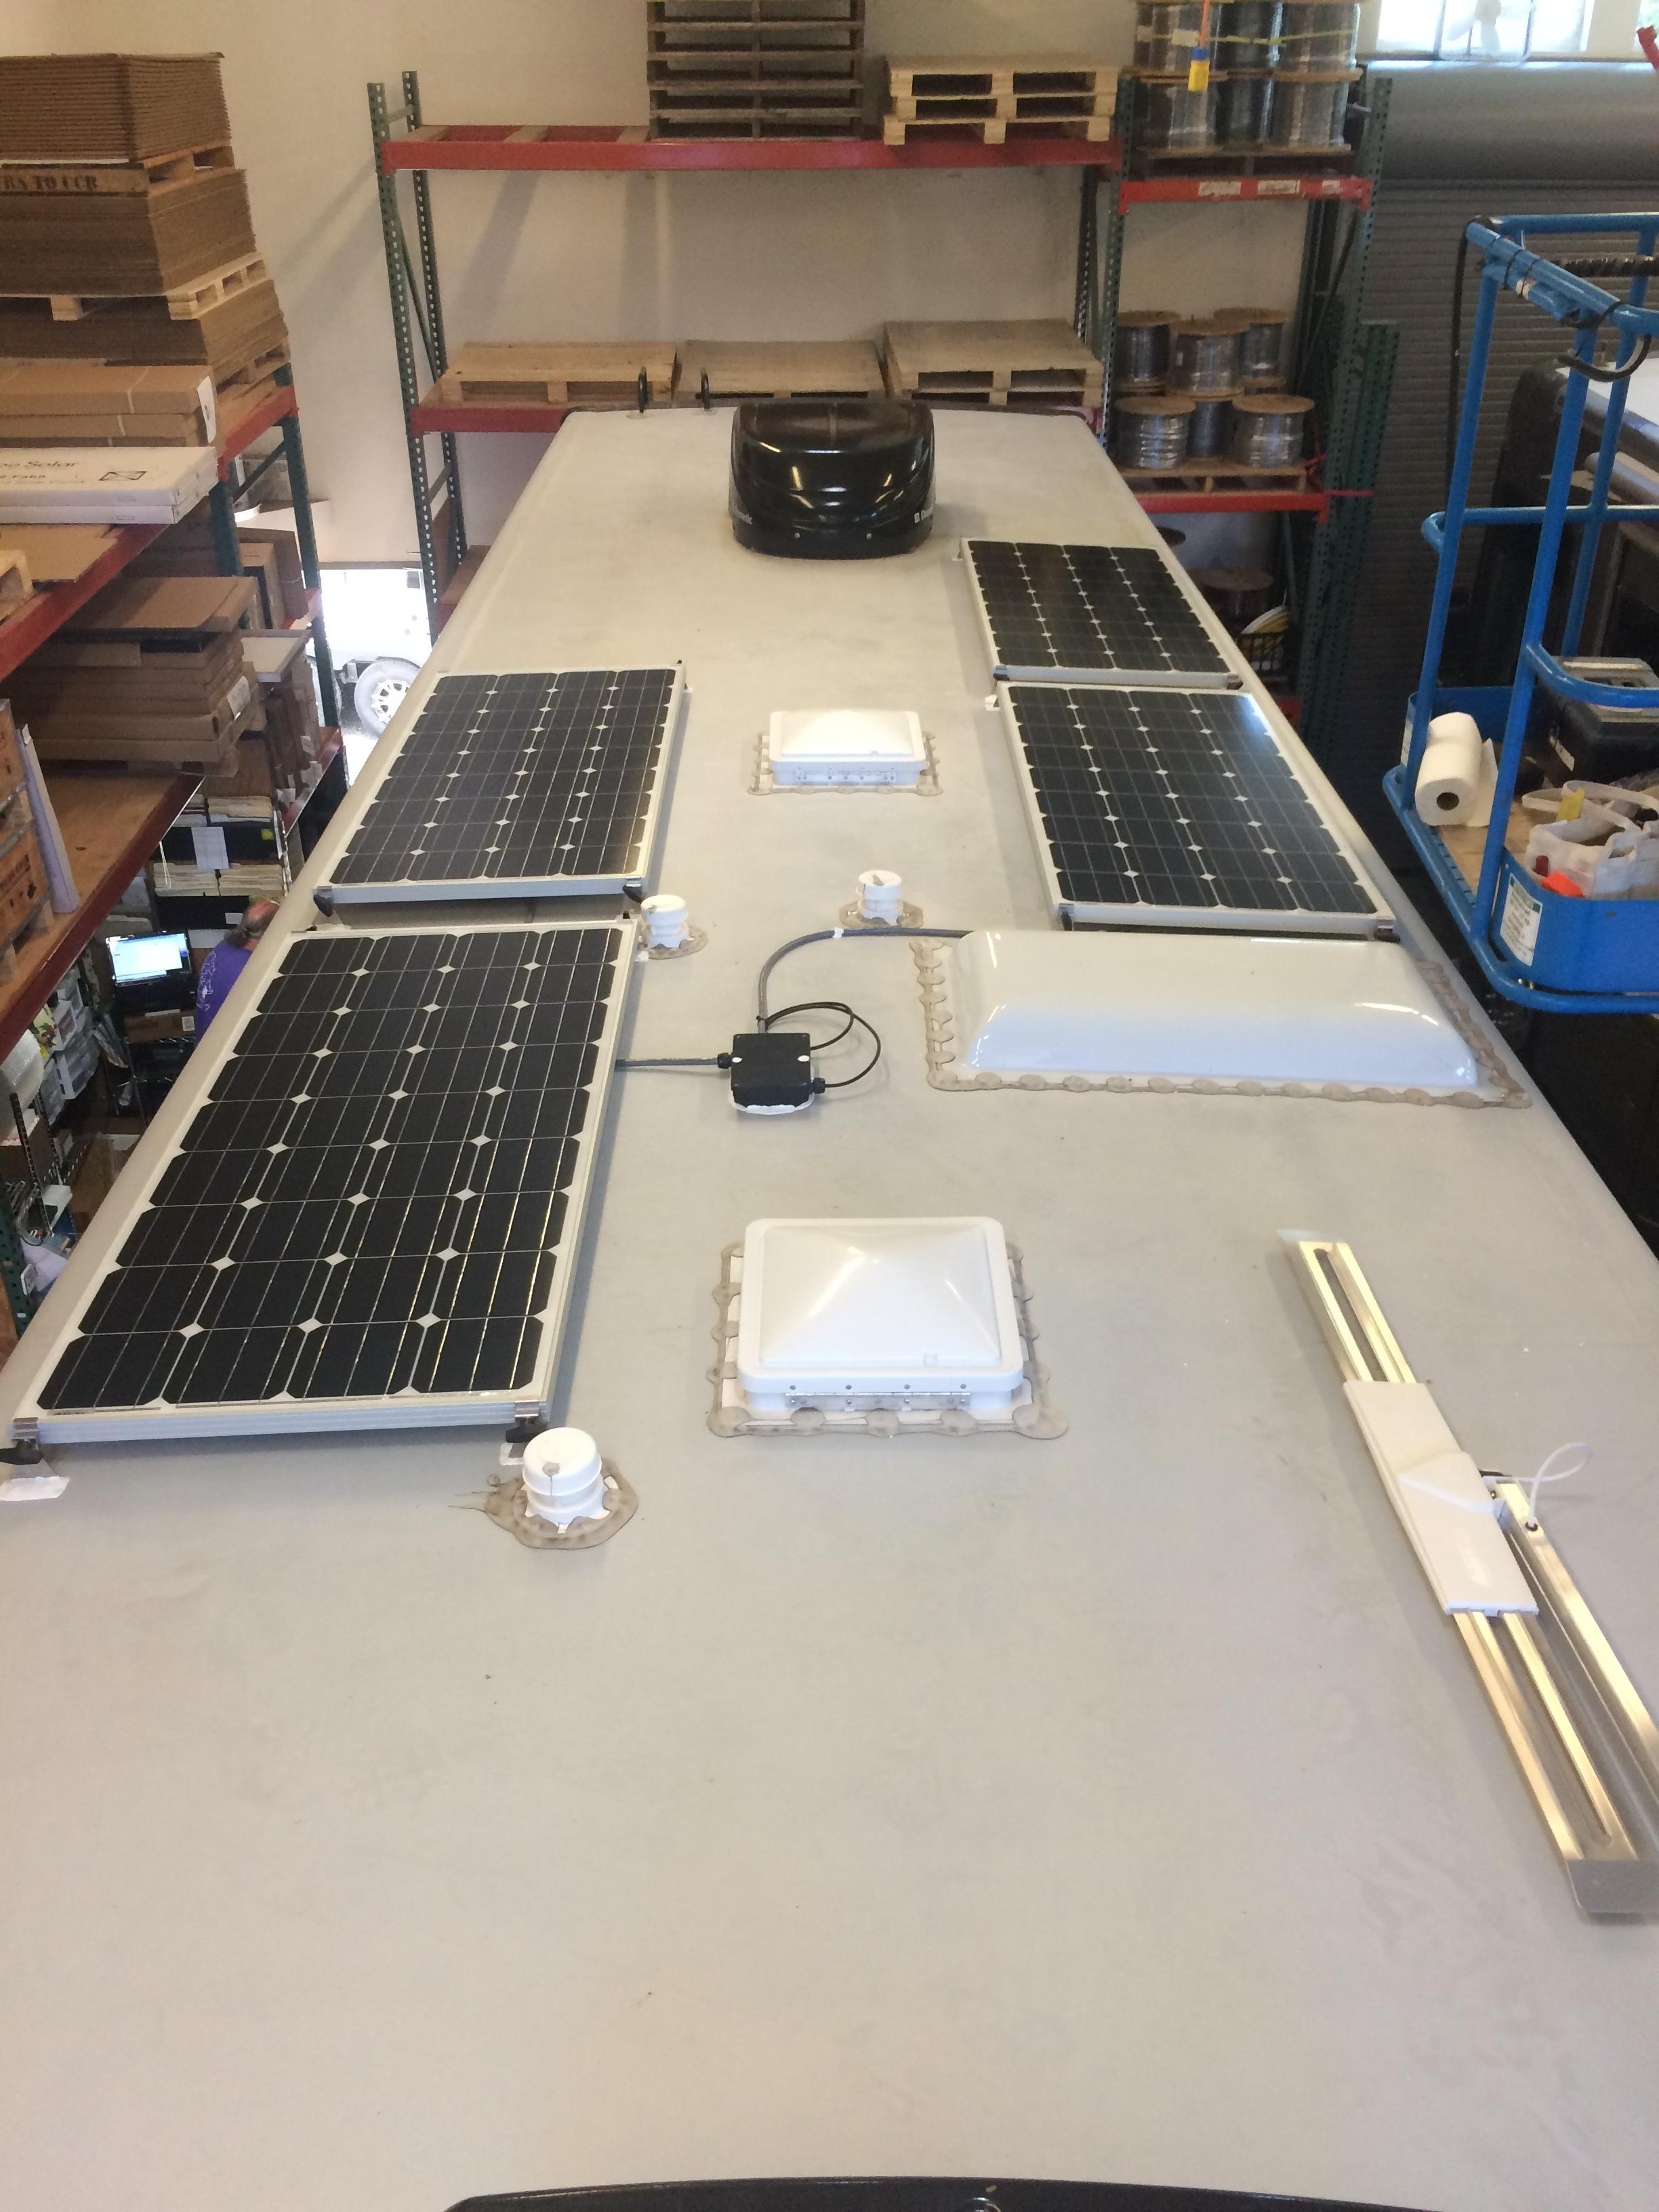 640W of solar panels